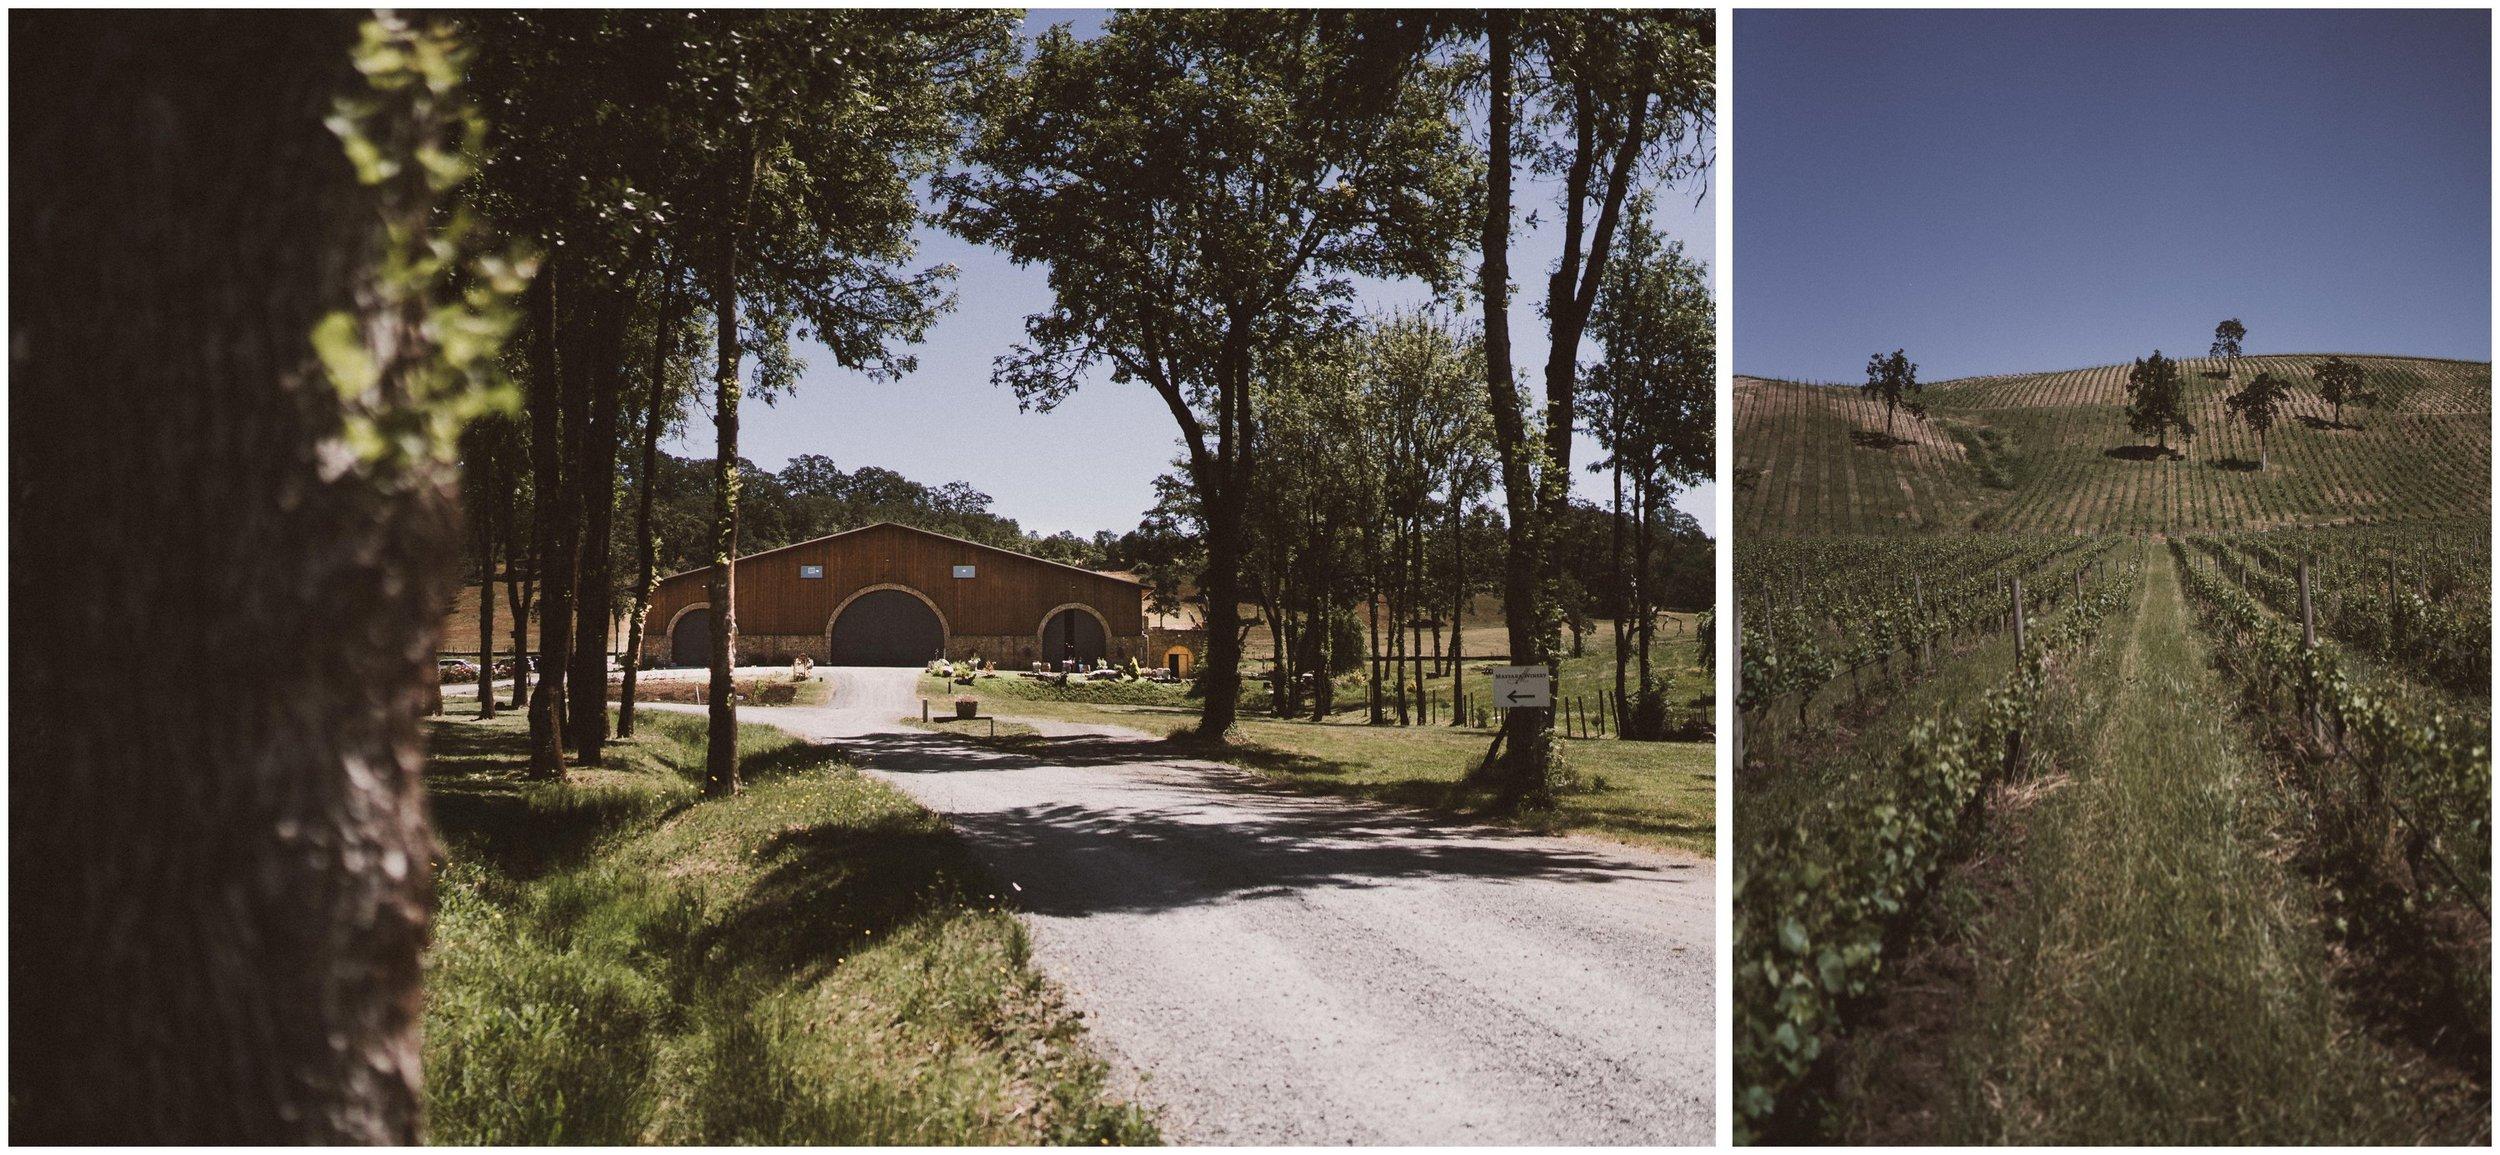 TONY-GAMBINO-PHOTOGRAPHY-BEND-OREGON-WEDDING-SHOOT-000_1500 maysara winery venue.jpg